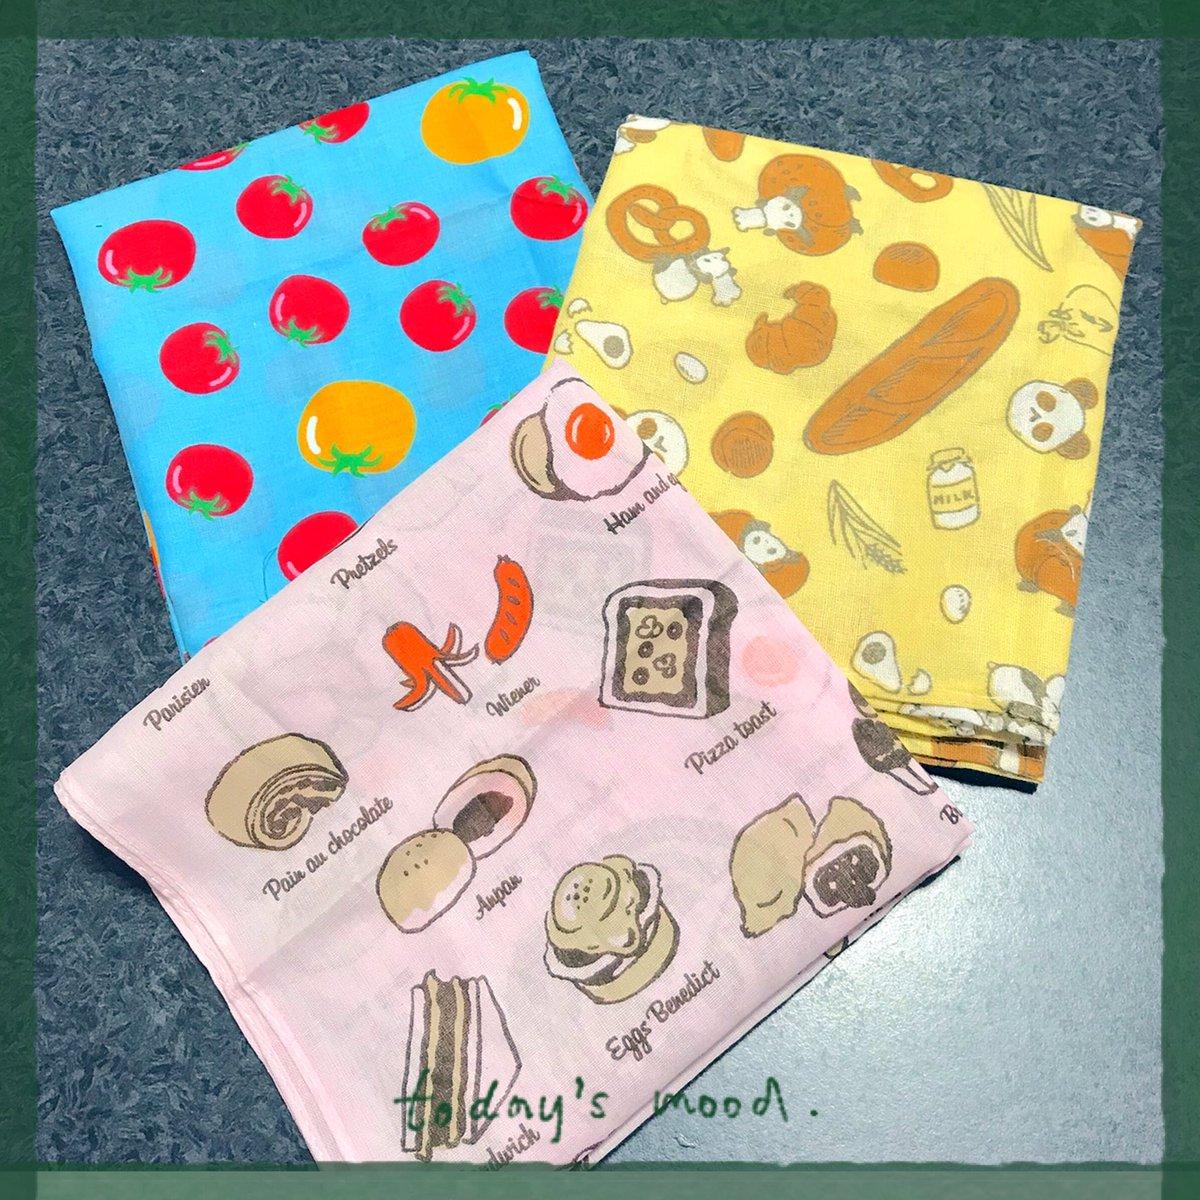 test ツイッターメディア - ダイソーで購入した手ぬぐいで『あずま袋』を作りました  #ダイソー #手ぬぐい #あずま袋 https://t.co/HY0Qsgm0WX